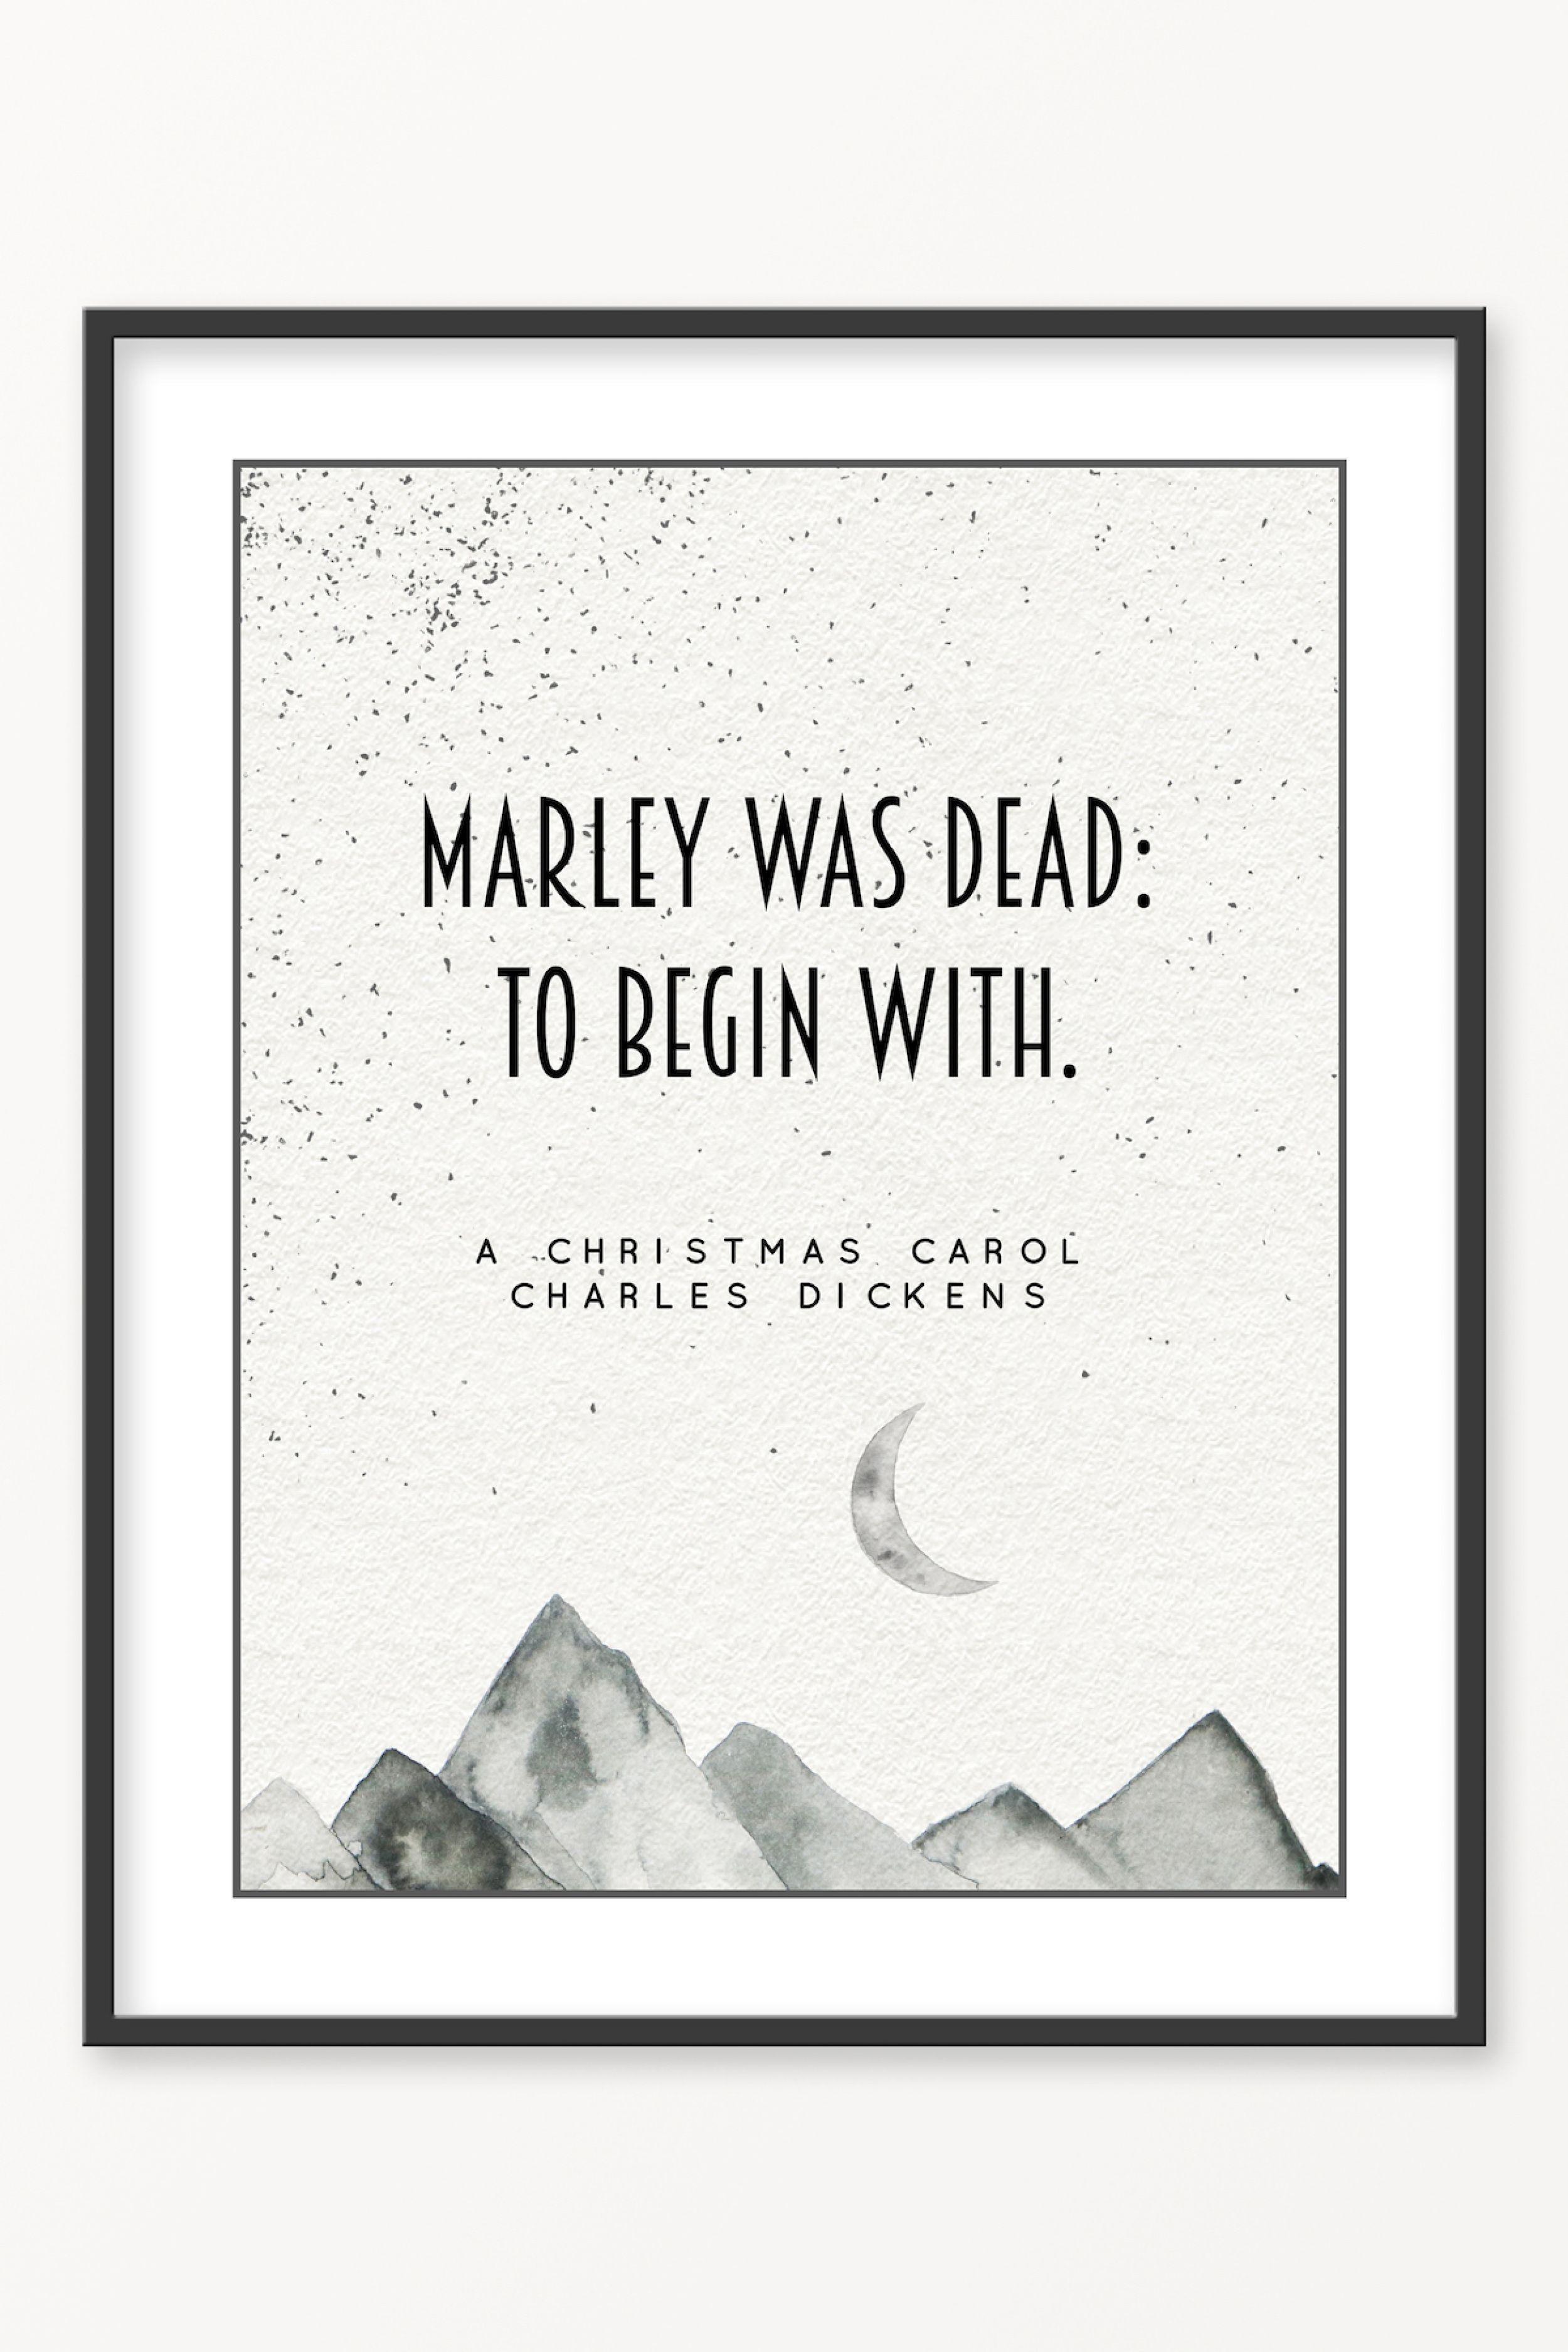 A Christmas Carol Charles Dickens Literary Poster